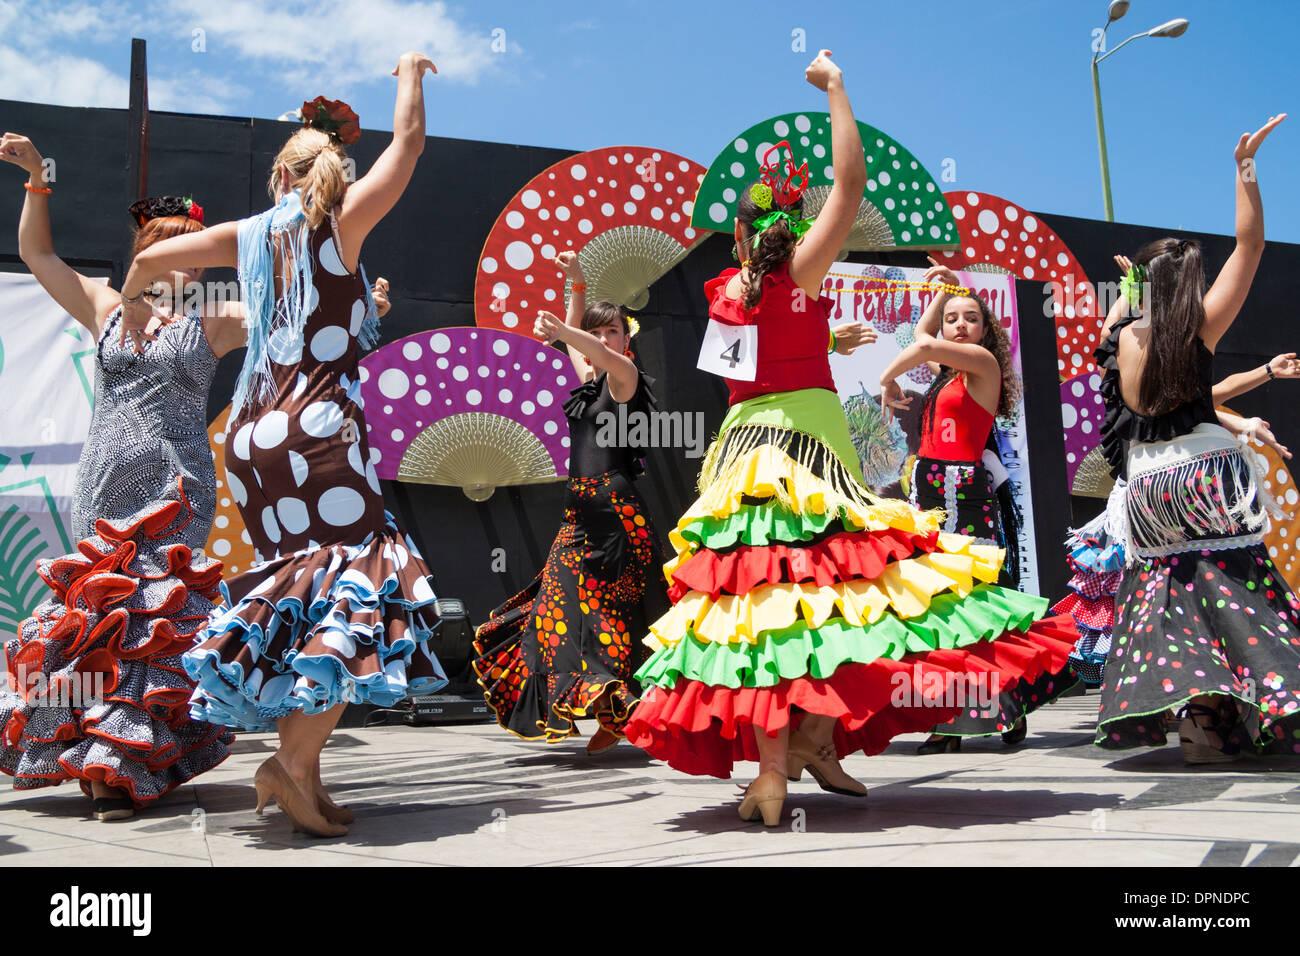 Flamenco dancers at Feria de Abril Flamenco weekend in Las Palmas, Gran Canaria, Canary islands, Spain Stock Foto